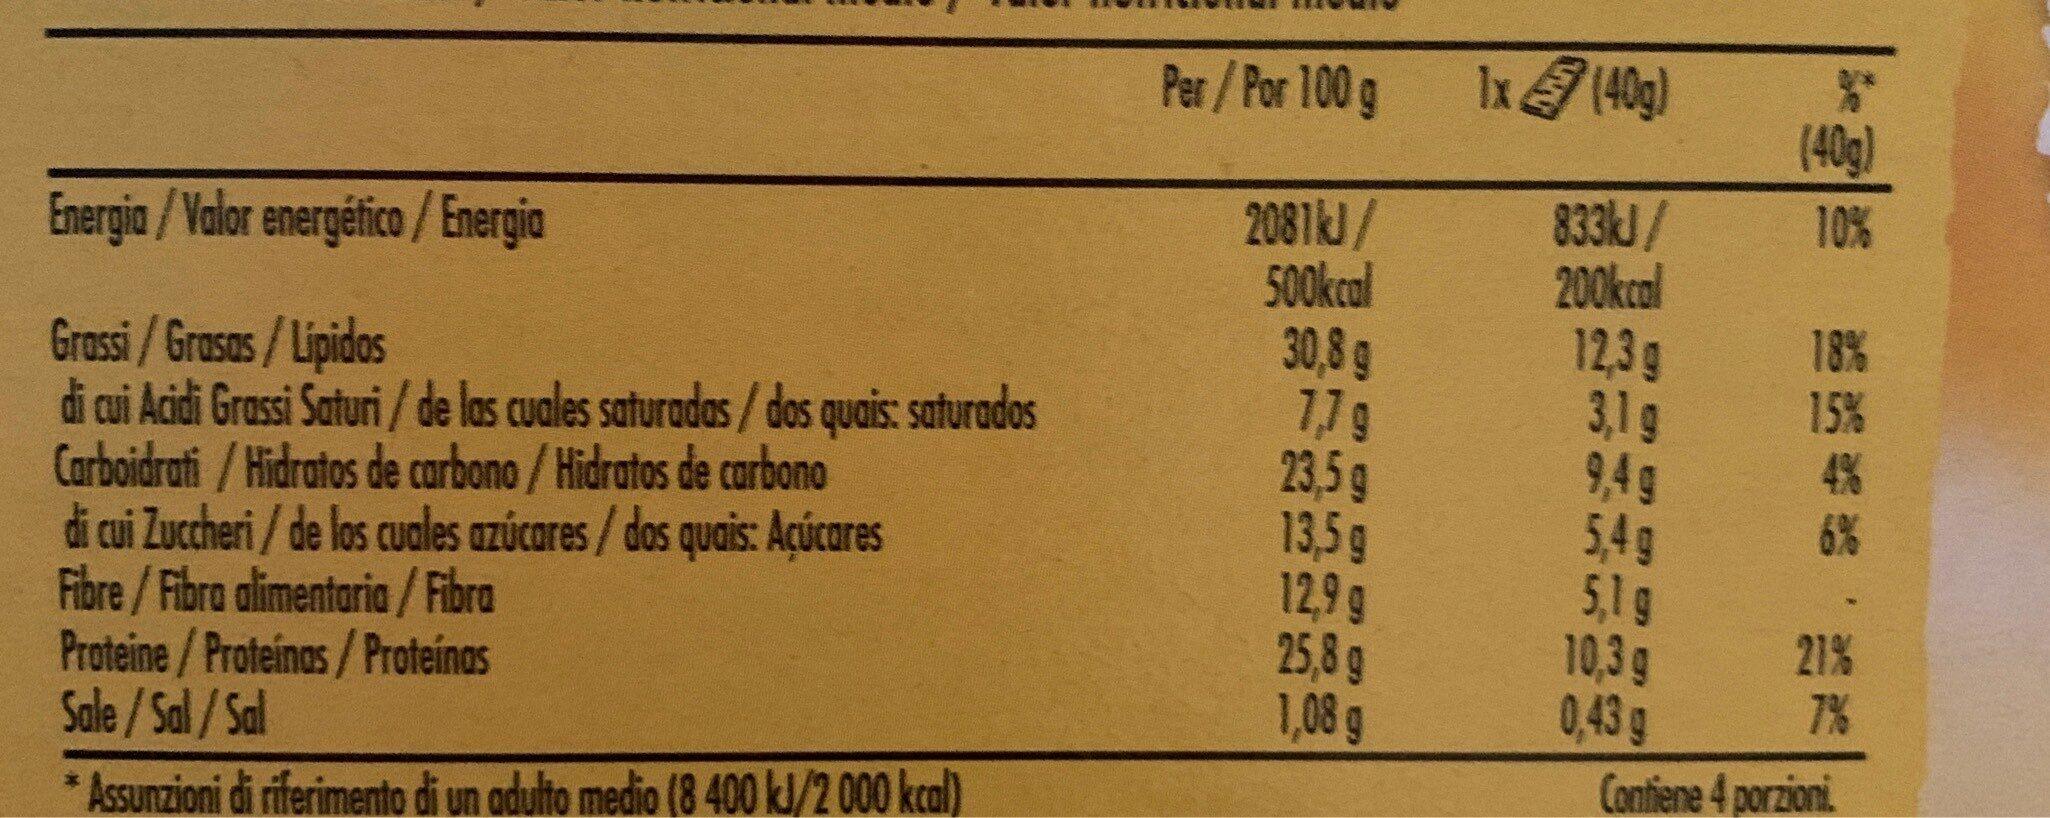 Protein caramello salato - Información nutricional - es